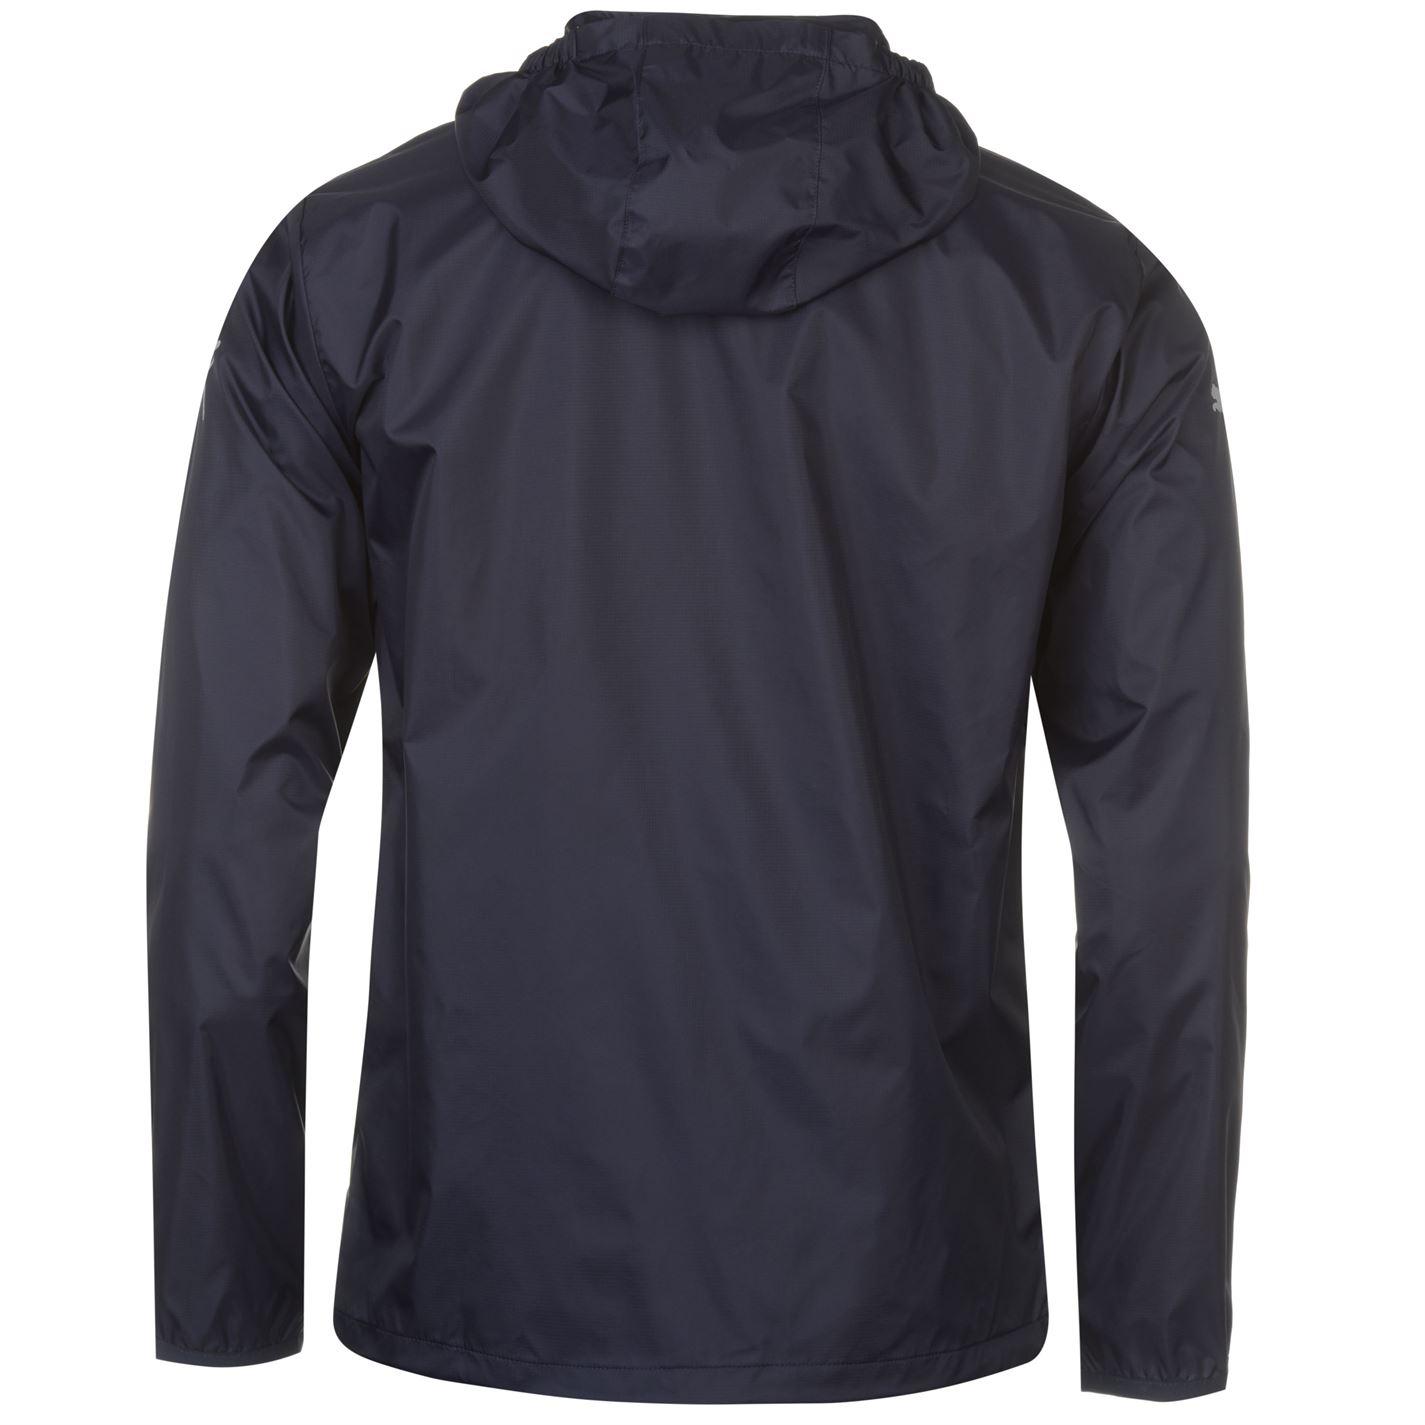 Puma Mens Essential Rain Jacket Coat Top Breathable Hooded Zip Full WindCell